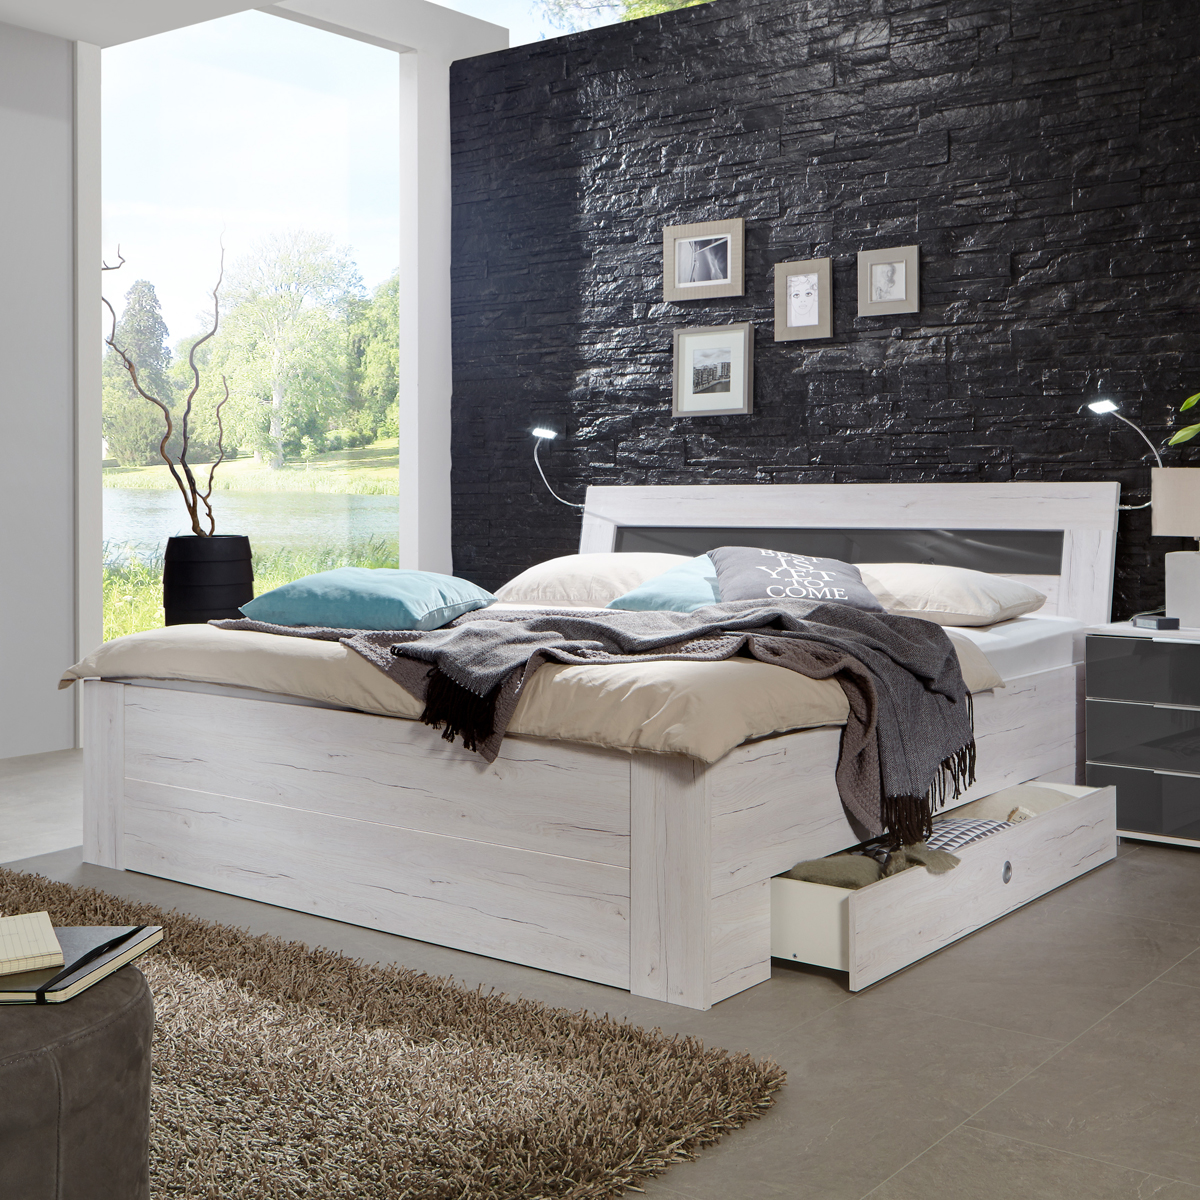 funktionsbett match up schlafzimmer wei eiche absetzung. Black Bedroom Furniture Sets. Home Design Ideas